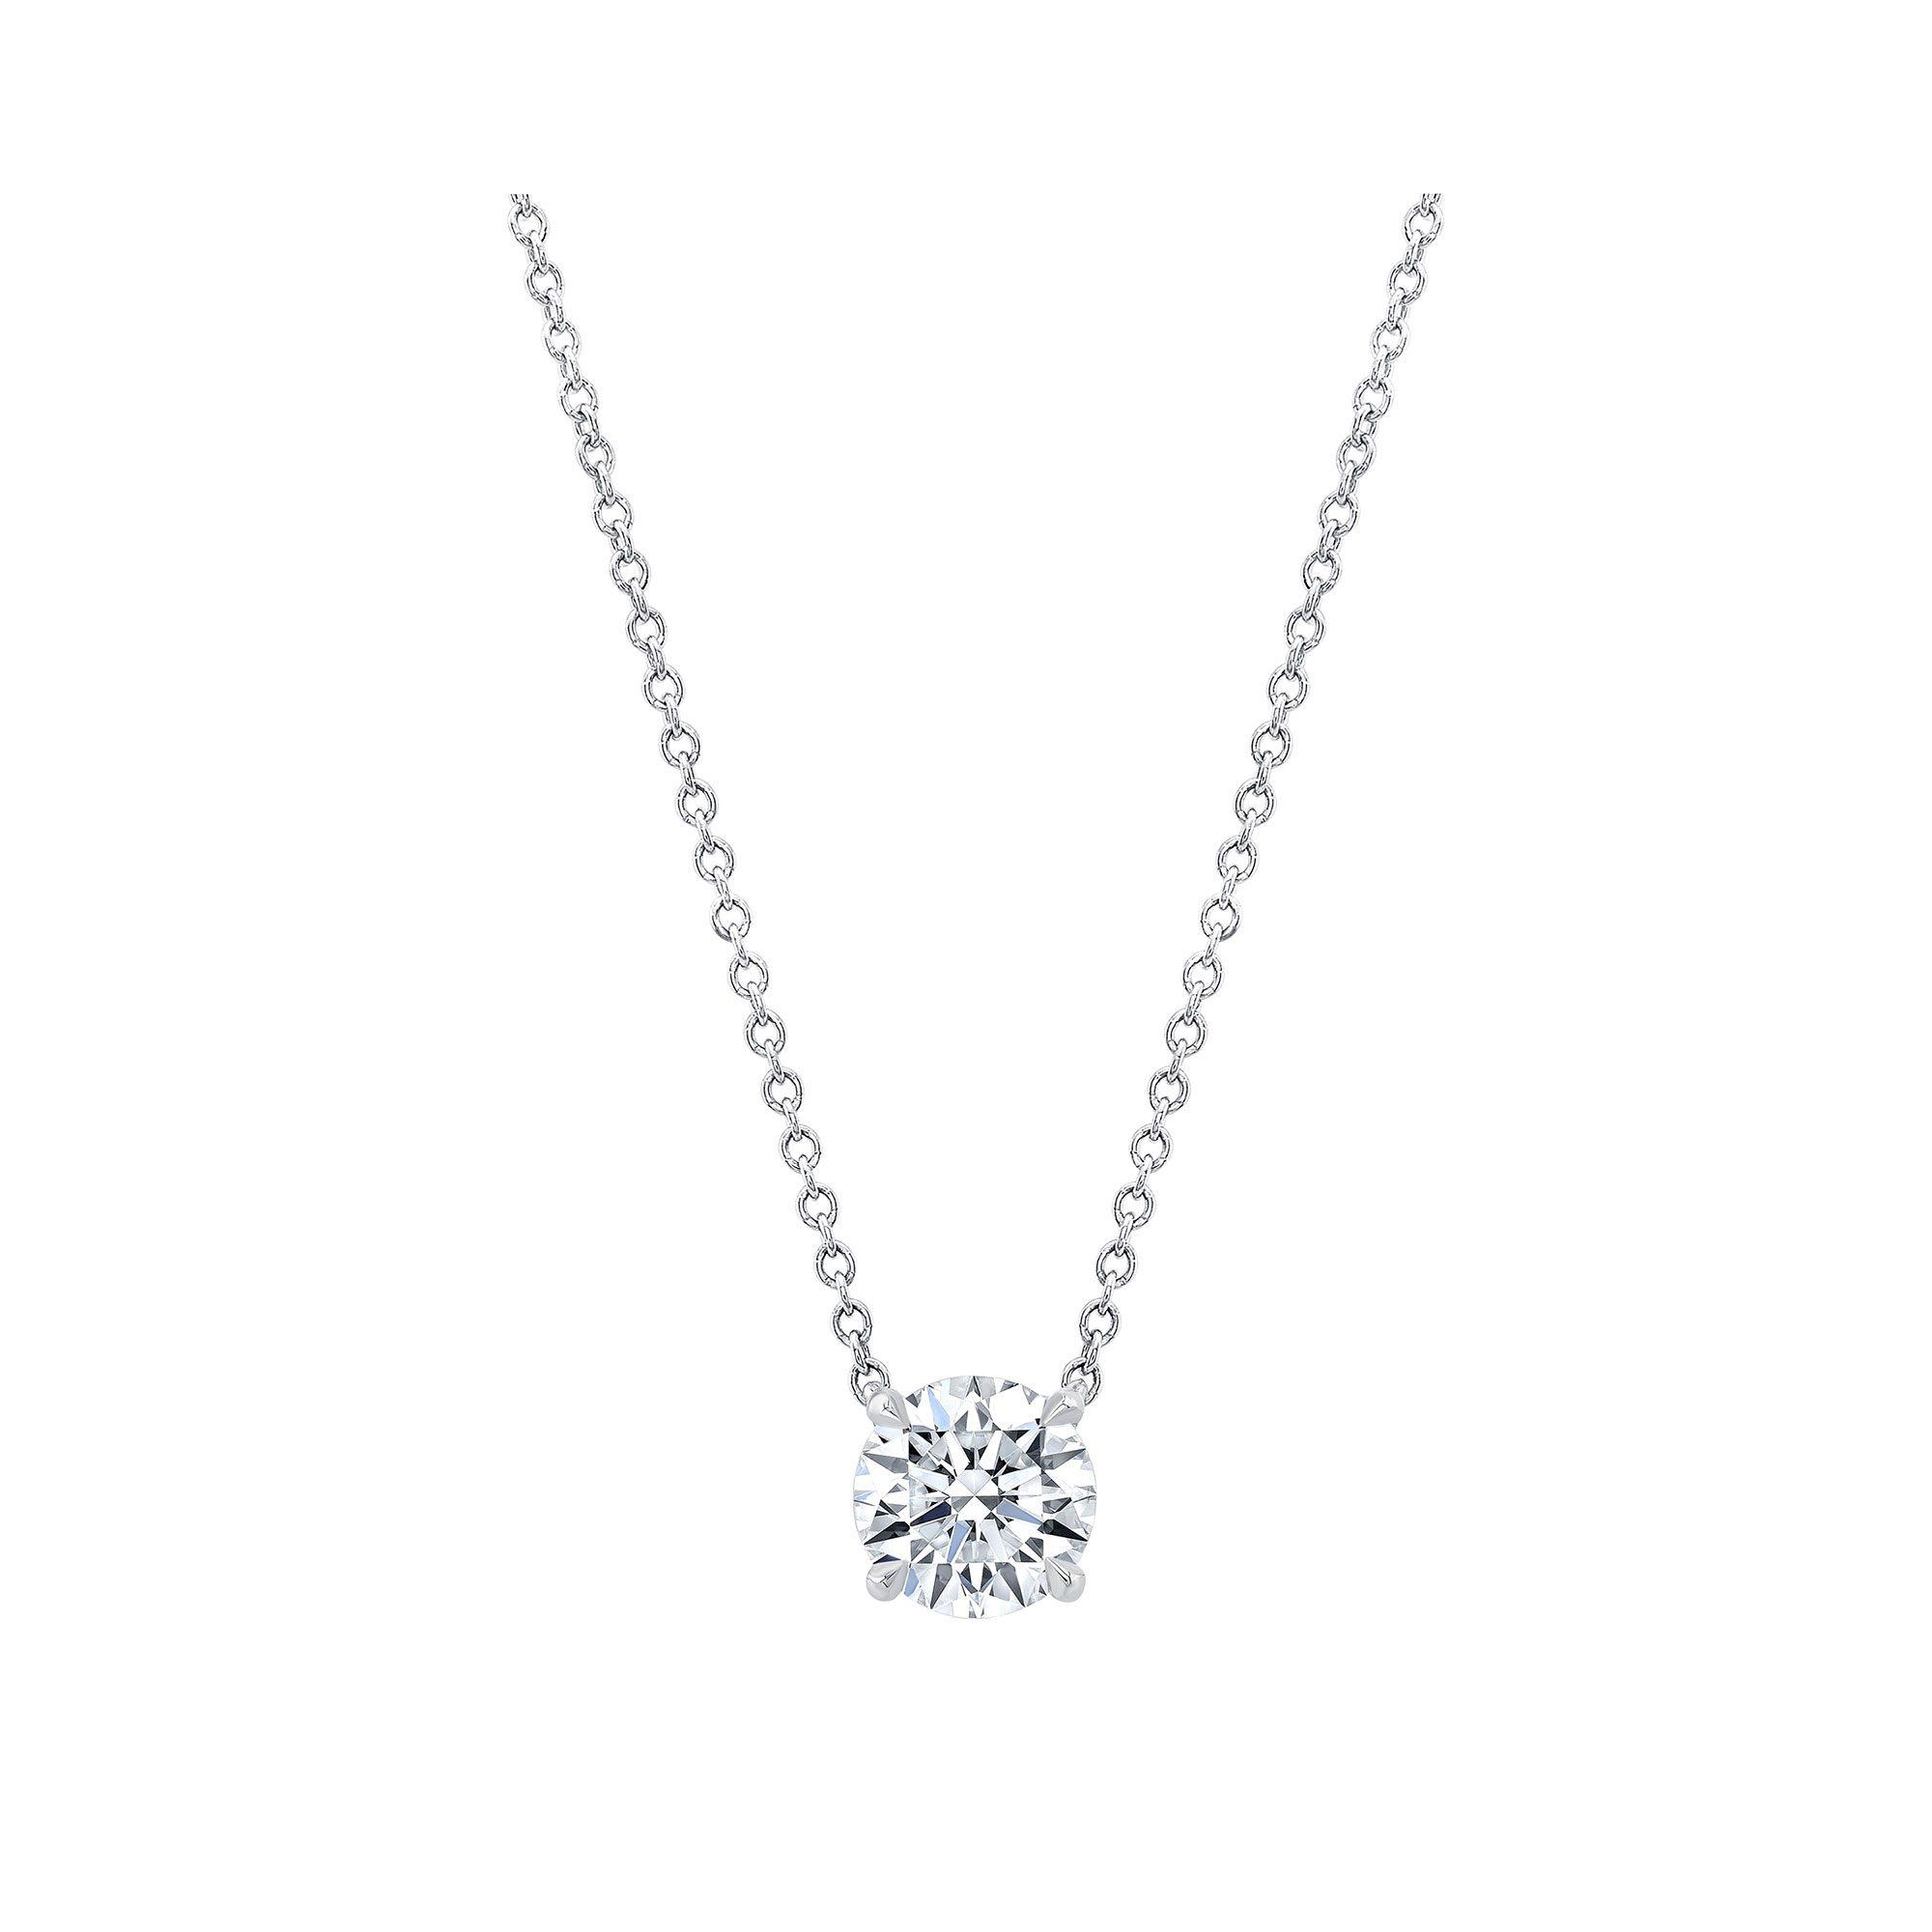 Marie Round Brilliant 1 Carat Lab Grown Diamond Necklace Pendant in White Gold